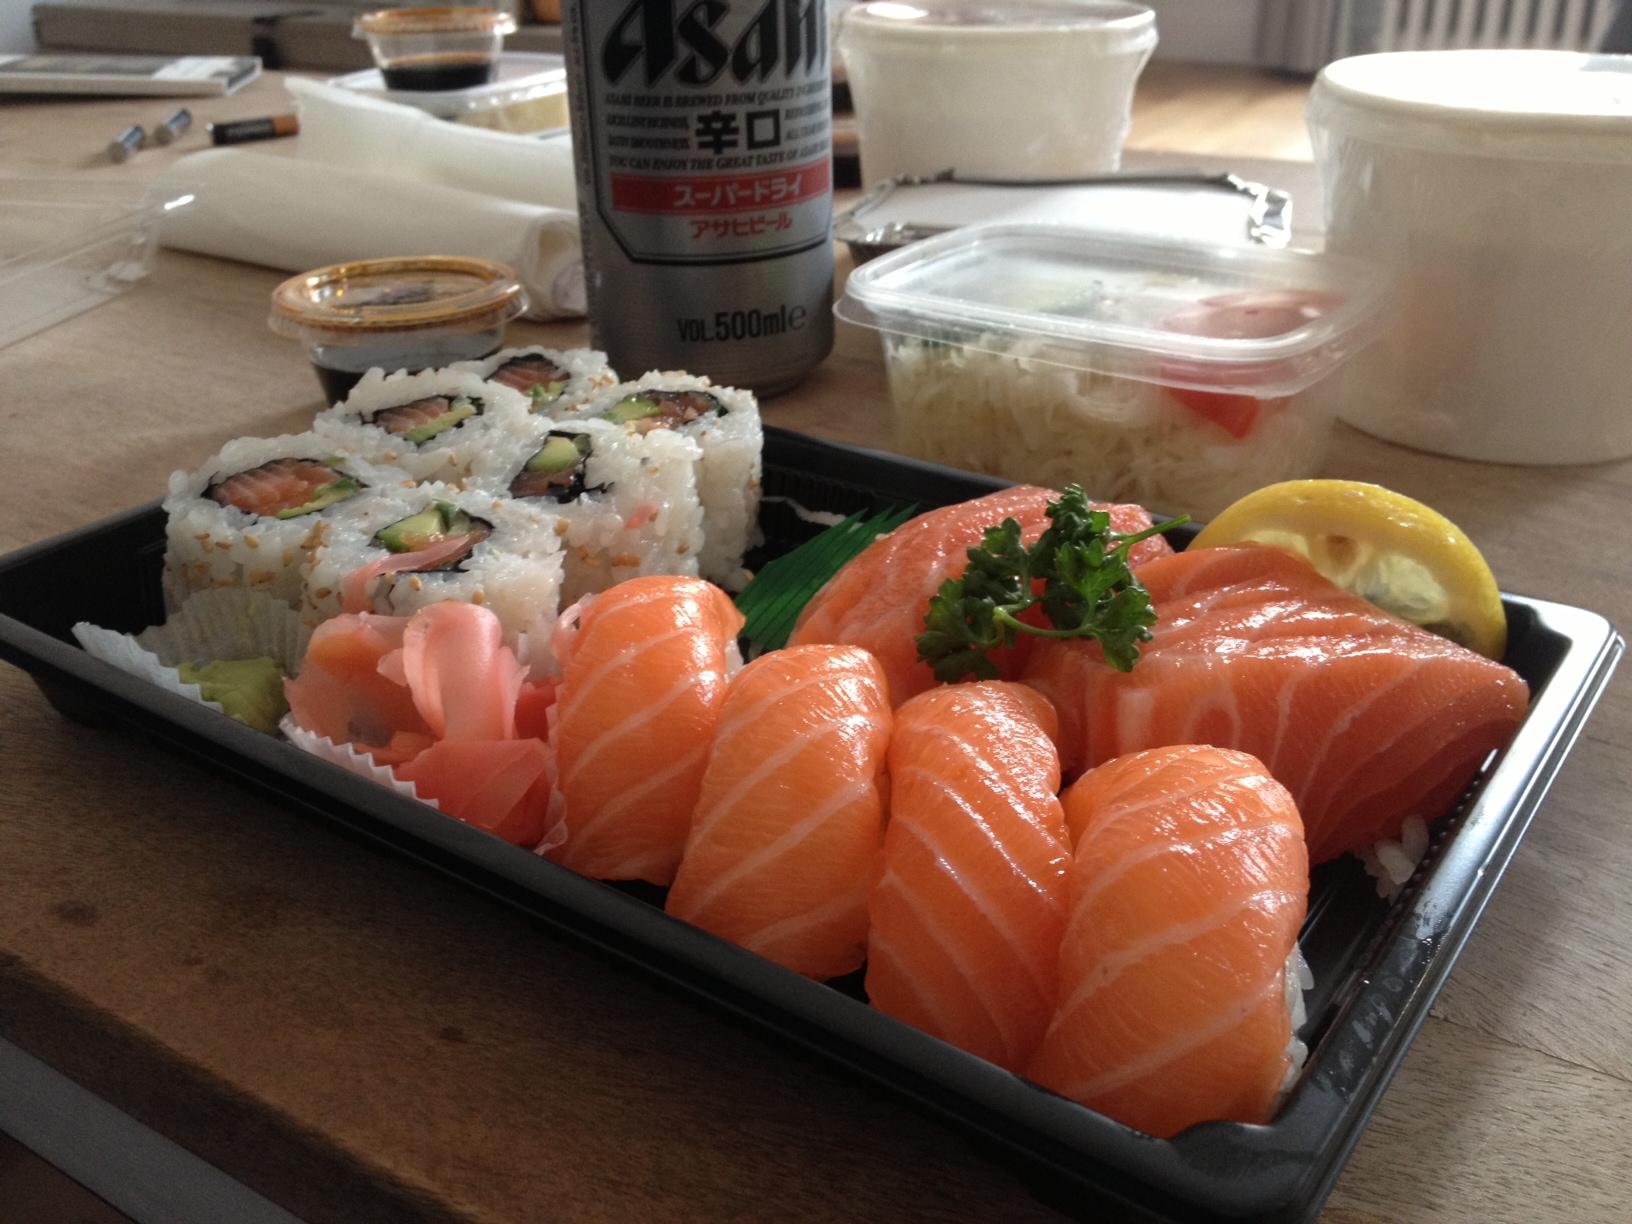 Shogun Sushi à Levallois-Perret